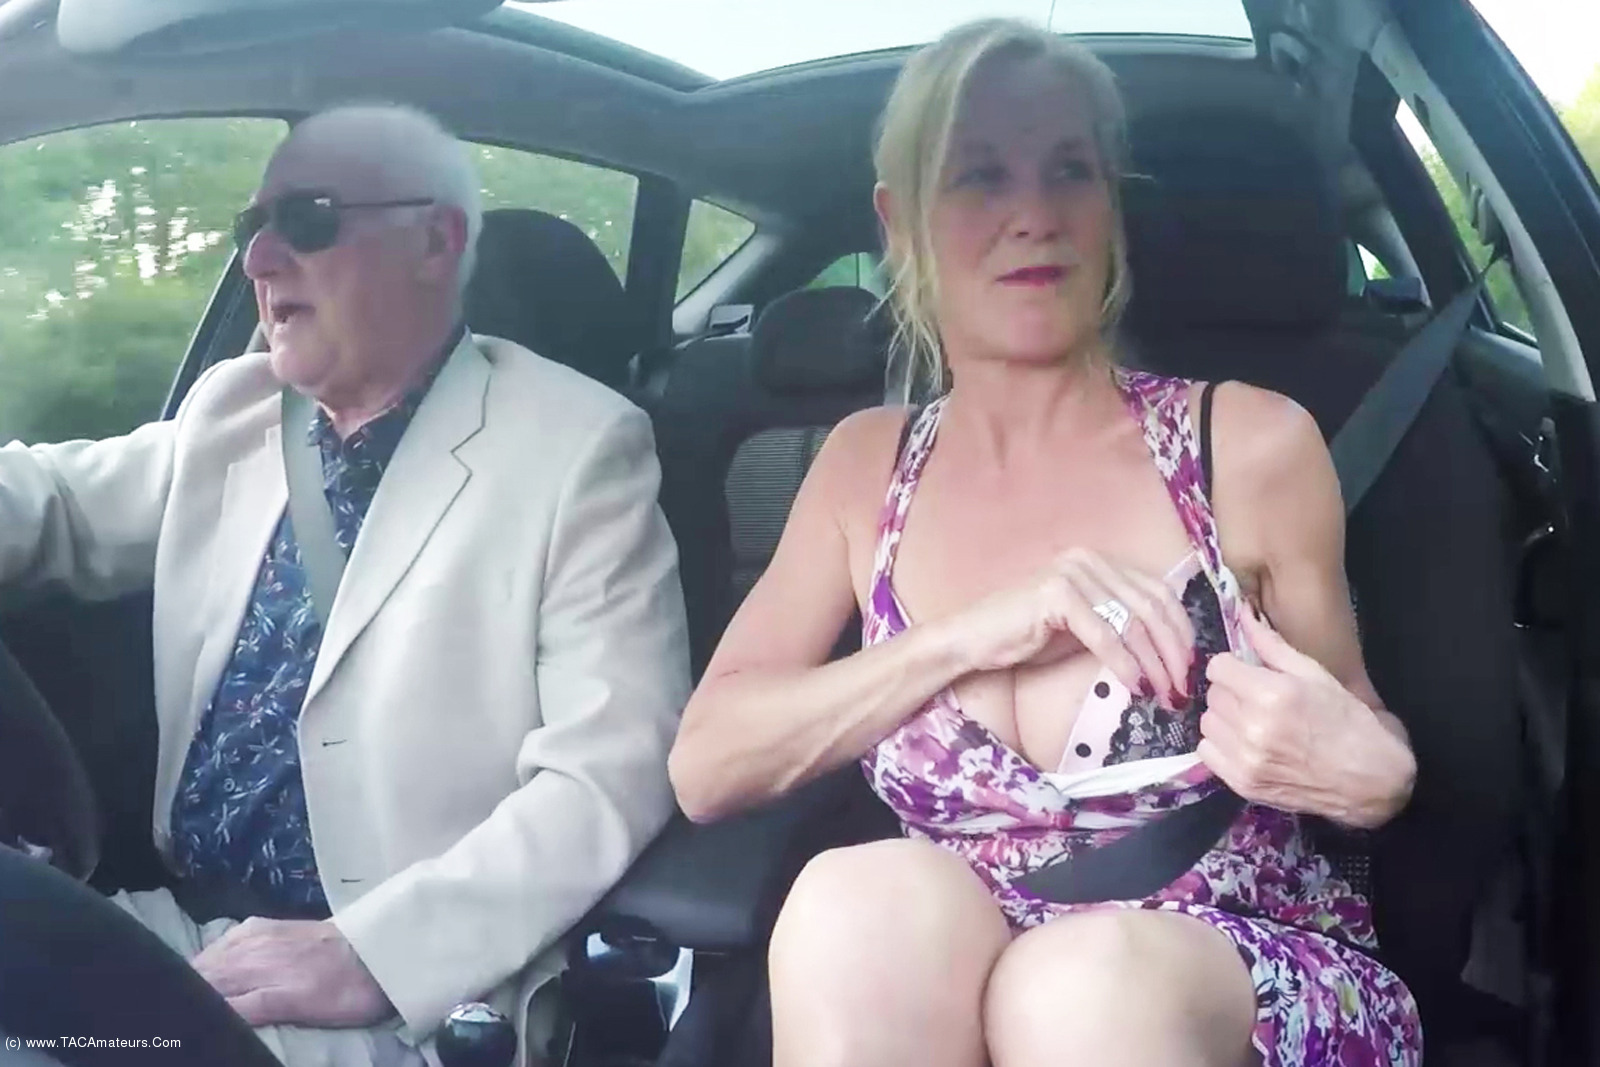 MollyMILF - Flashing In The Car scene 1